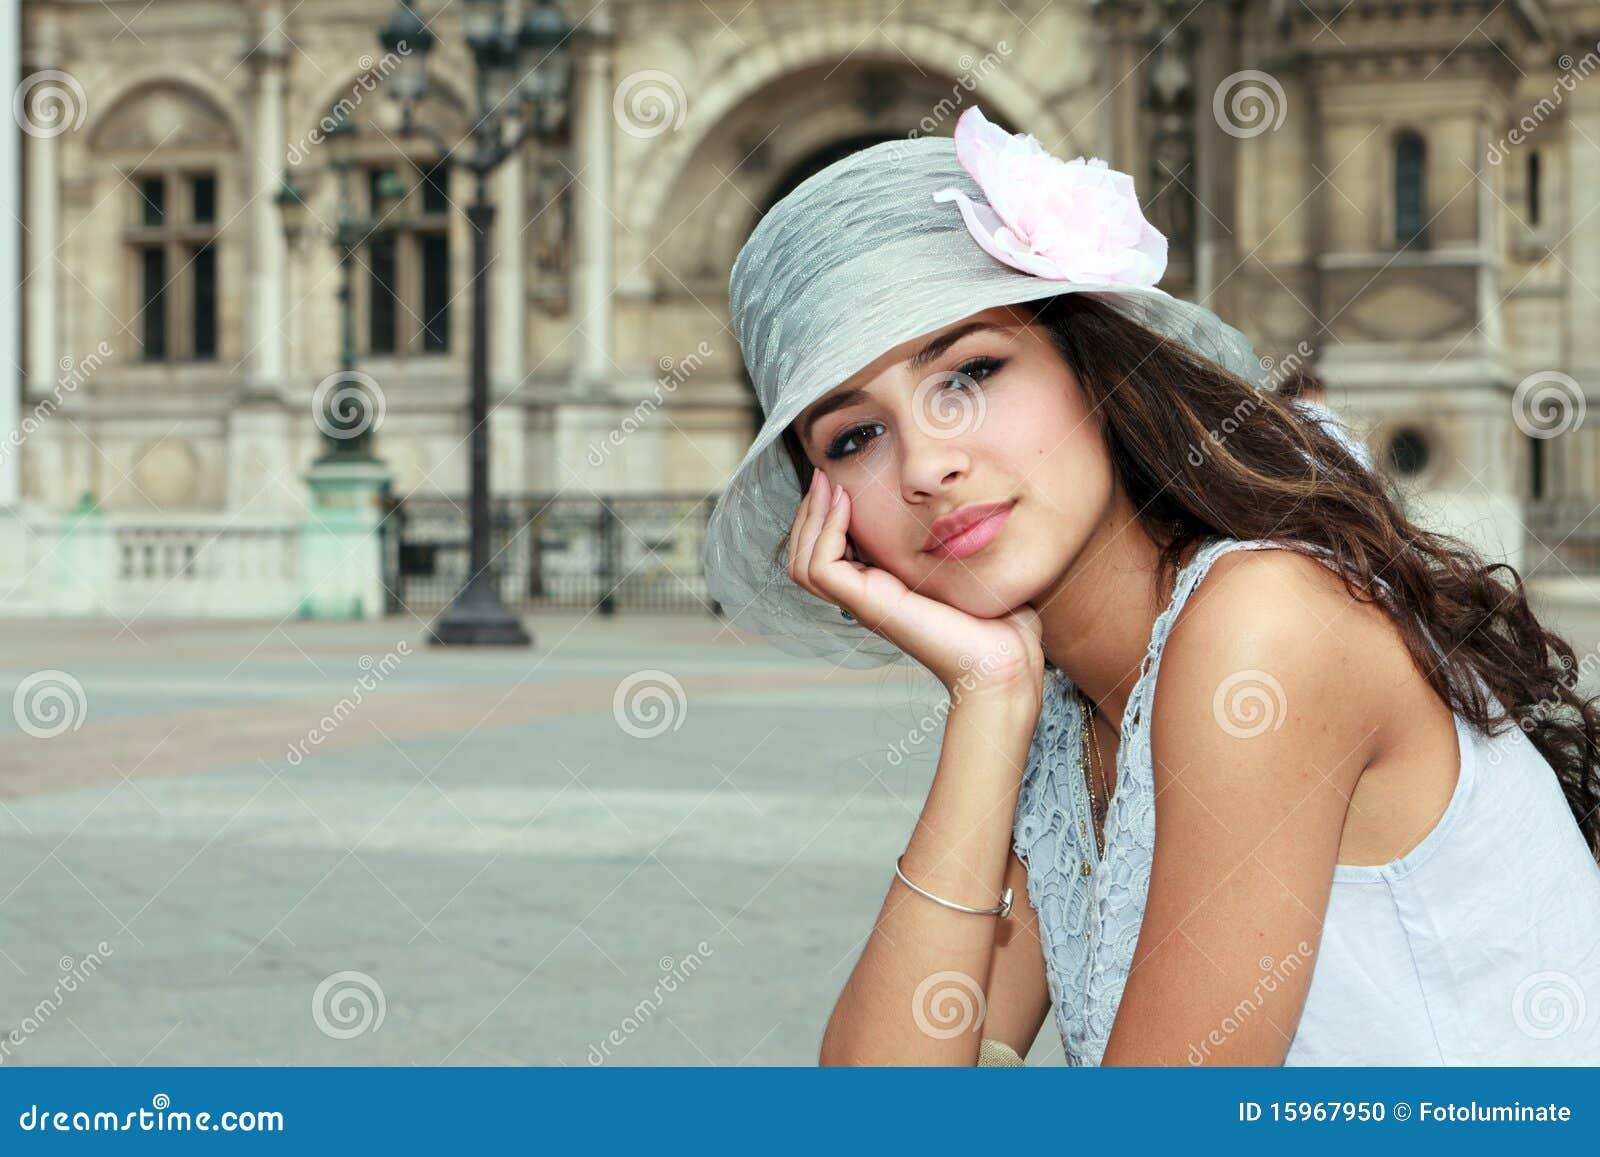 Француженки девушки фото 1 фотография